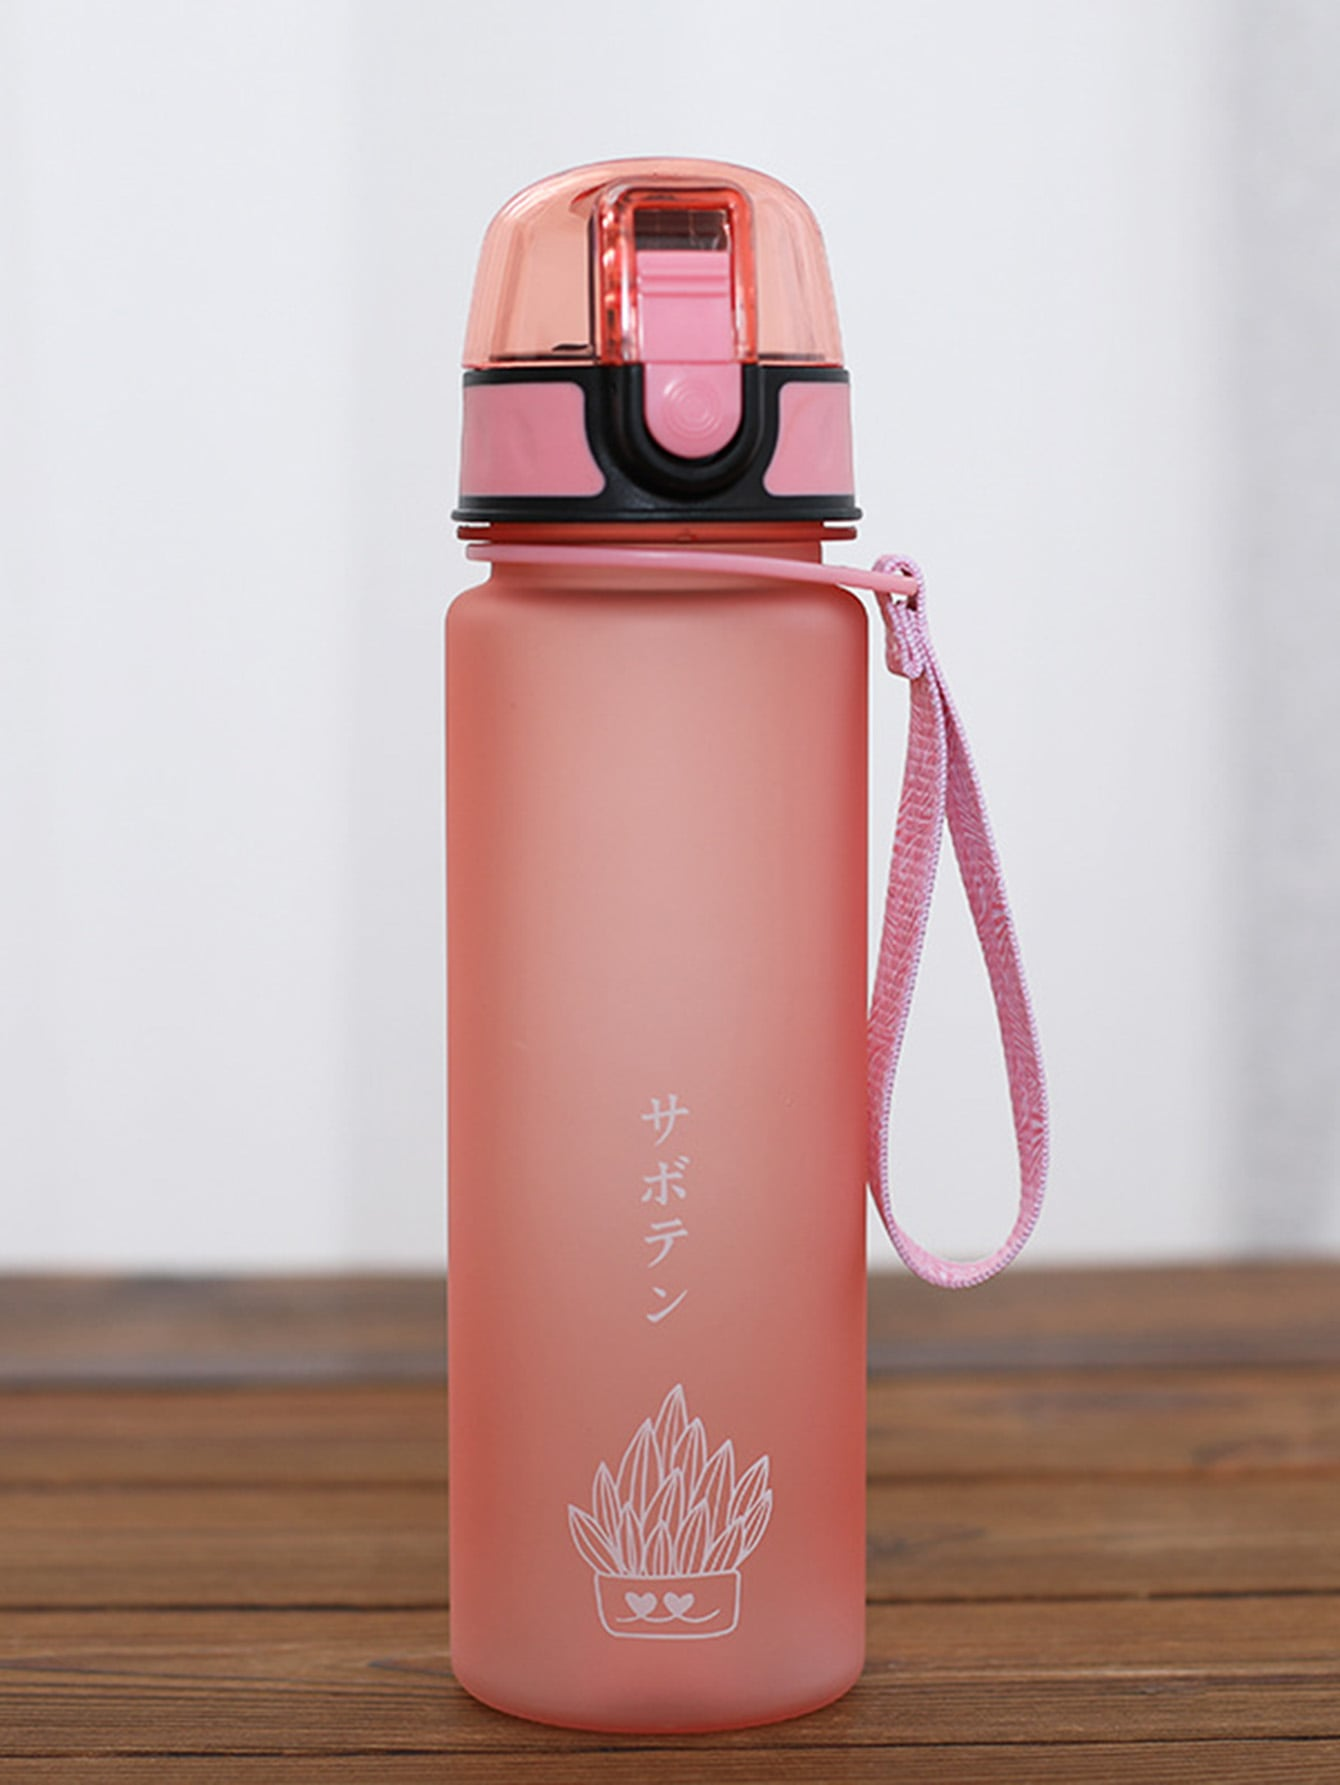 Water Bottle With Lid 500ml 500ml hydrogen rich cup generator alkaline water maker portable health bottle high concentration hydrogen water usb